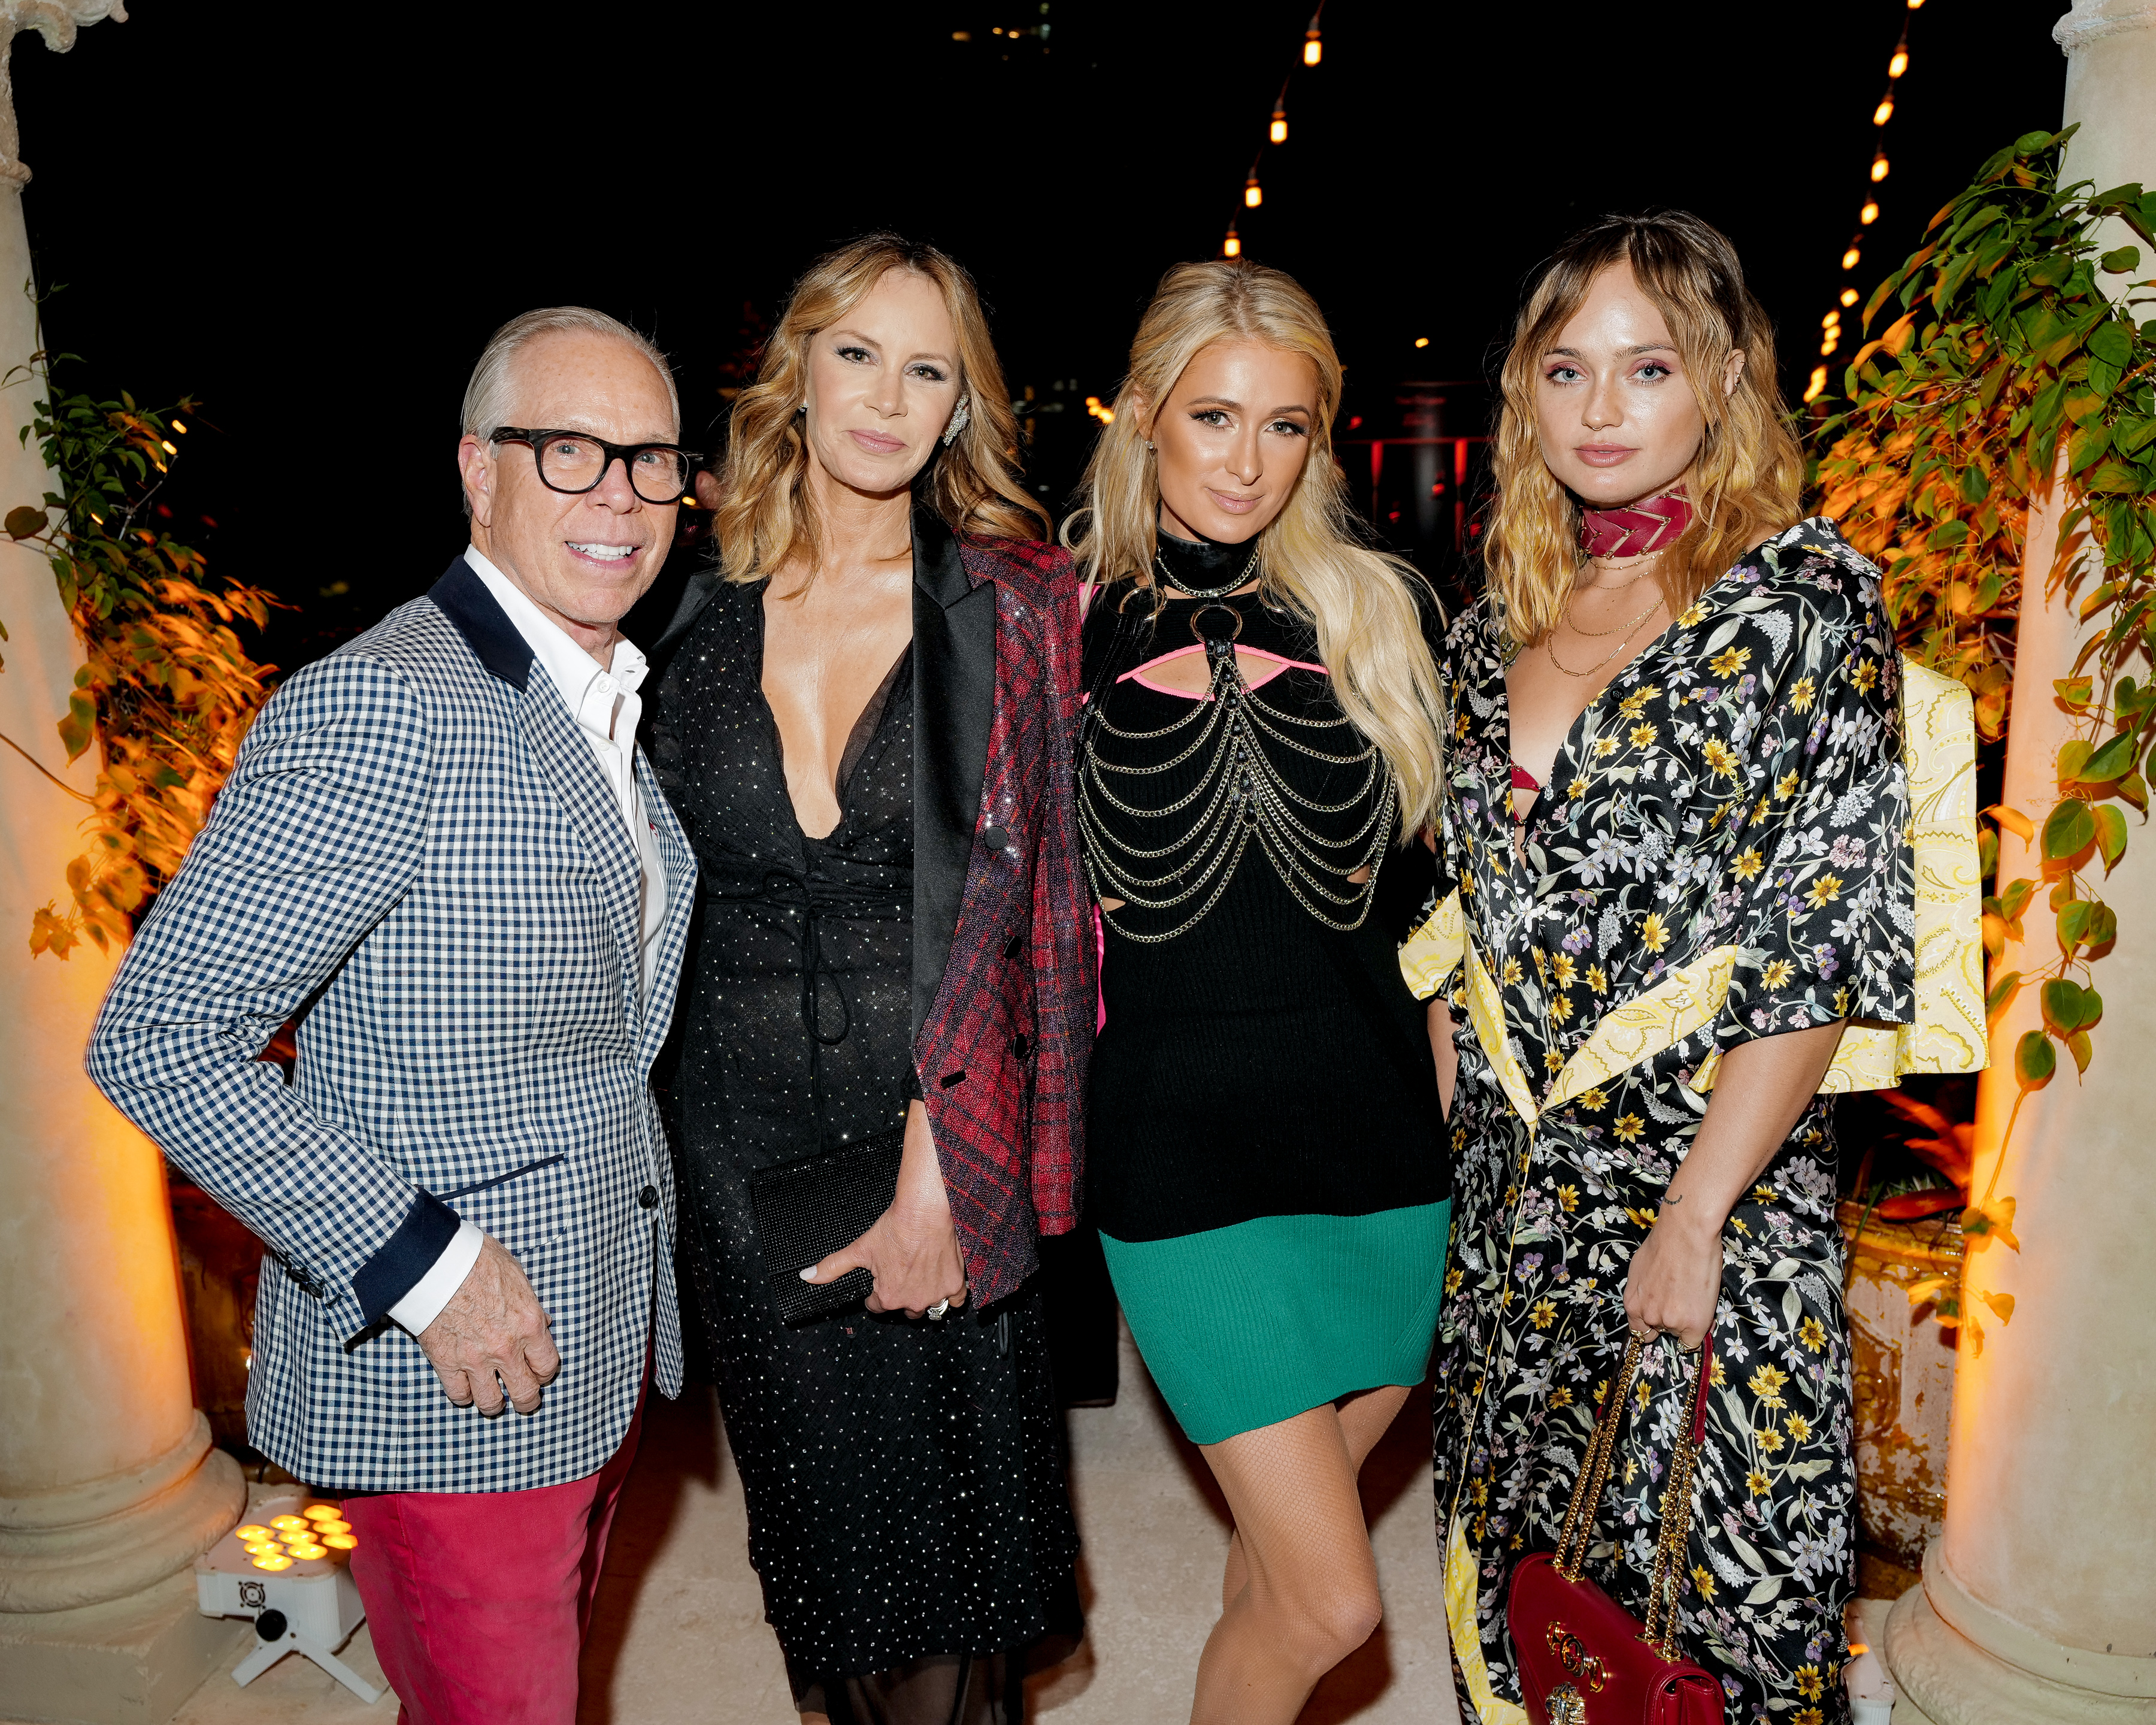 Thomas Hilfiger y Dee Ocleppo junto a Paris Hilton y Brandi Howe